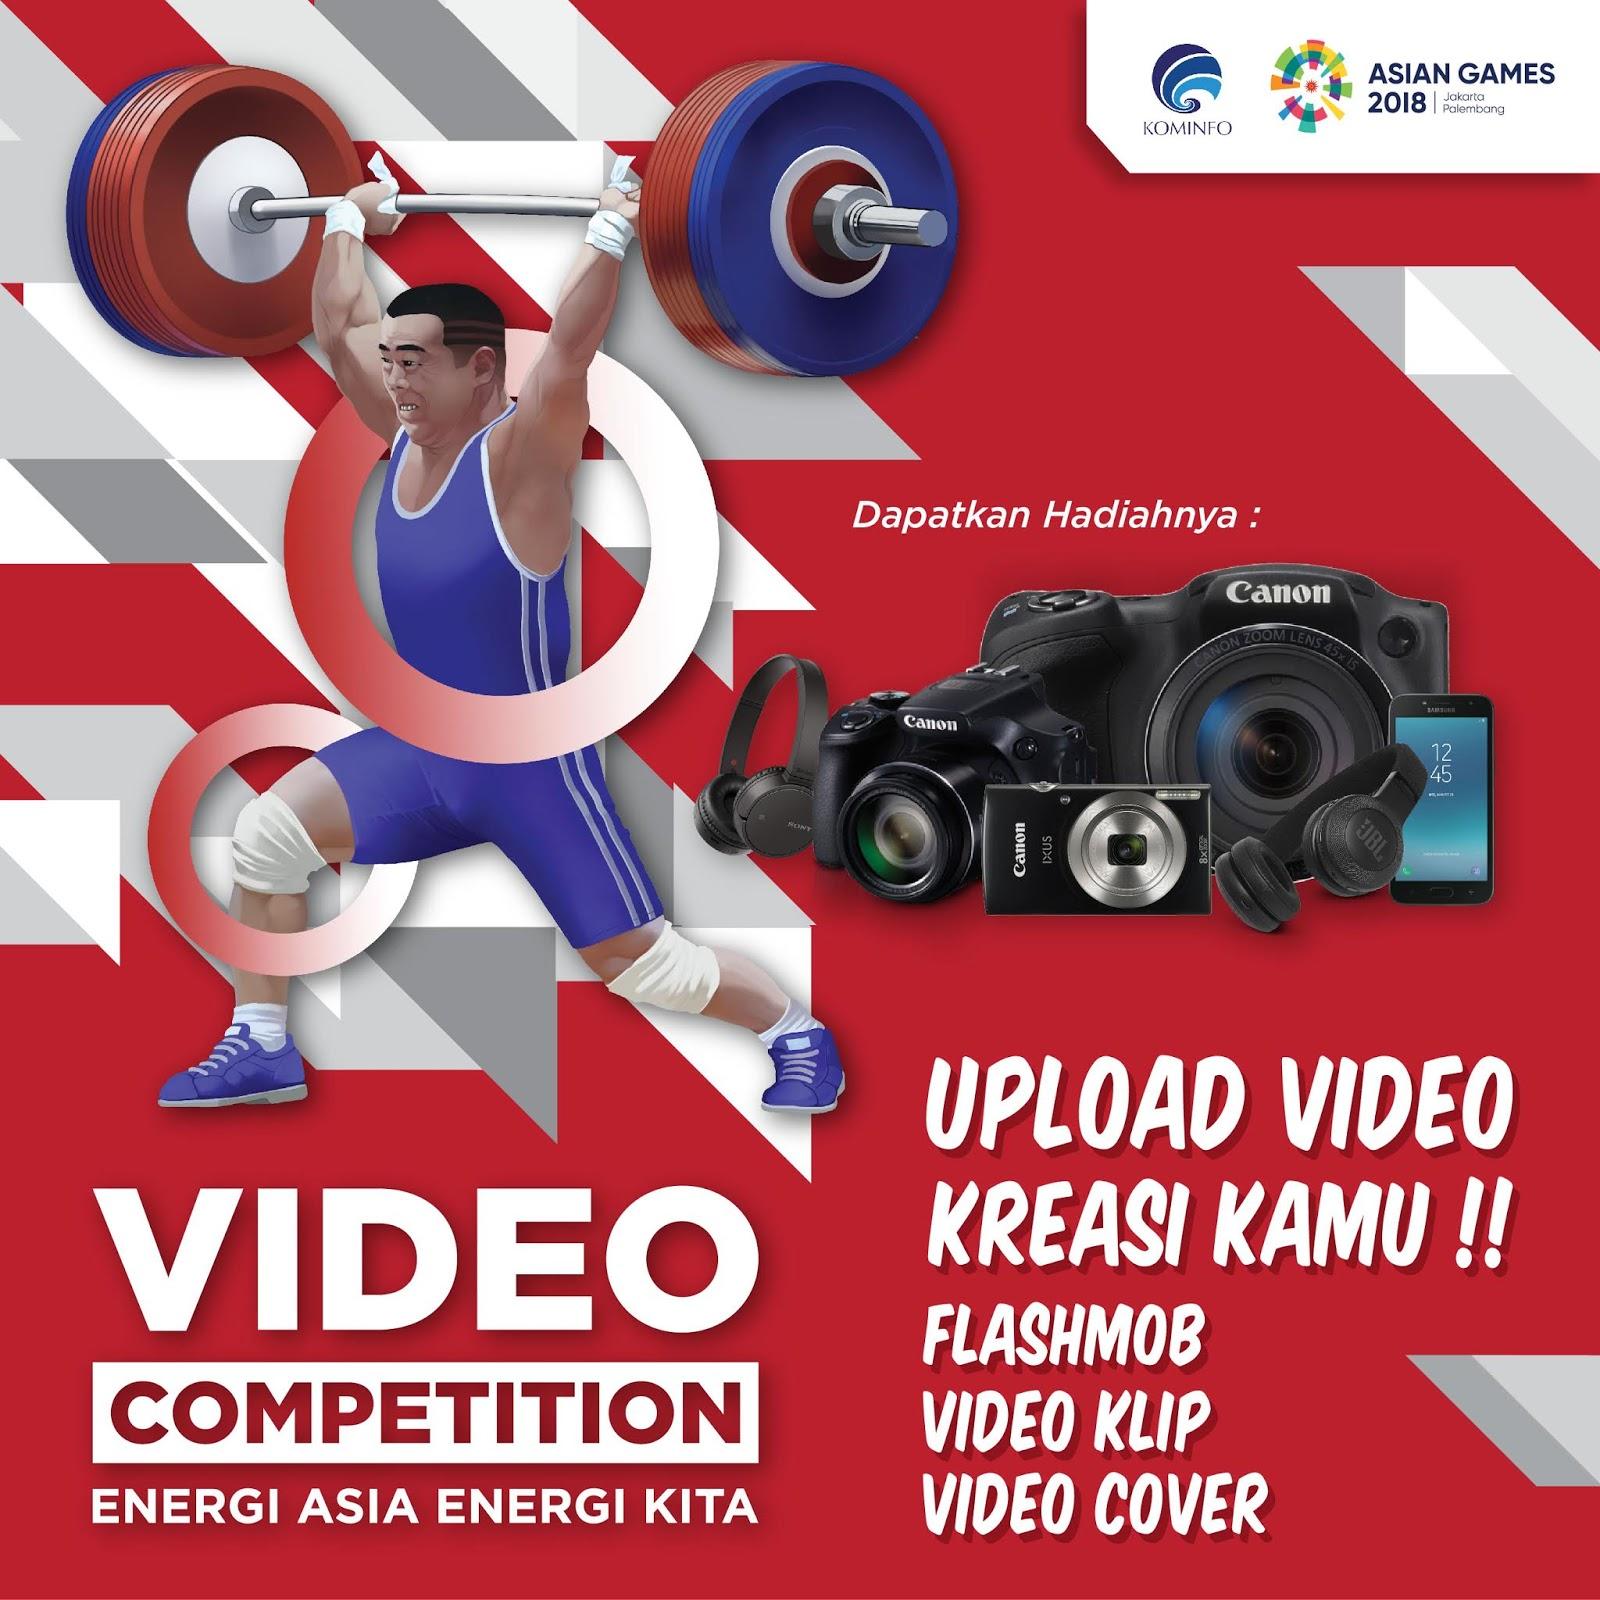 Download Lagu Asian Games 2018 Janger Persahabatan: Play Hard Work Smart